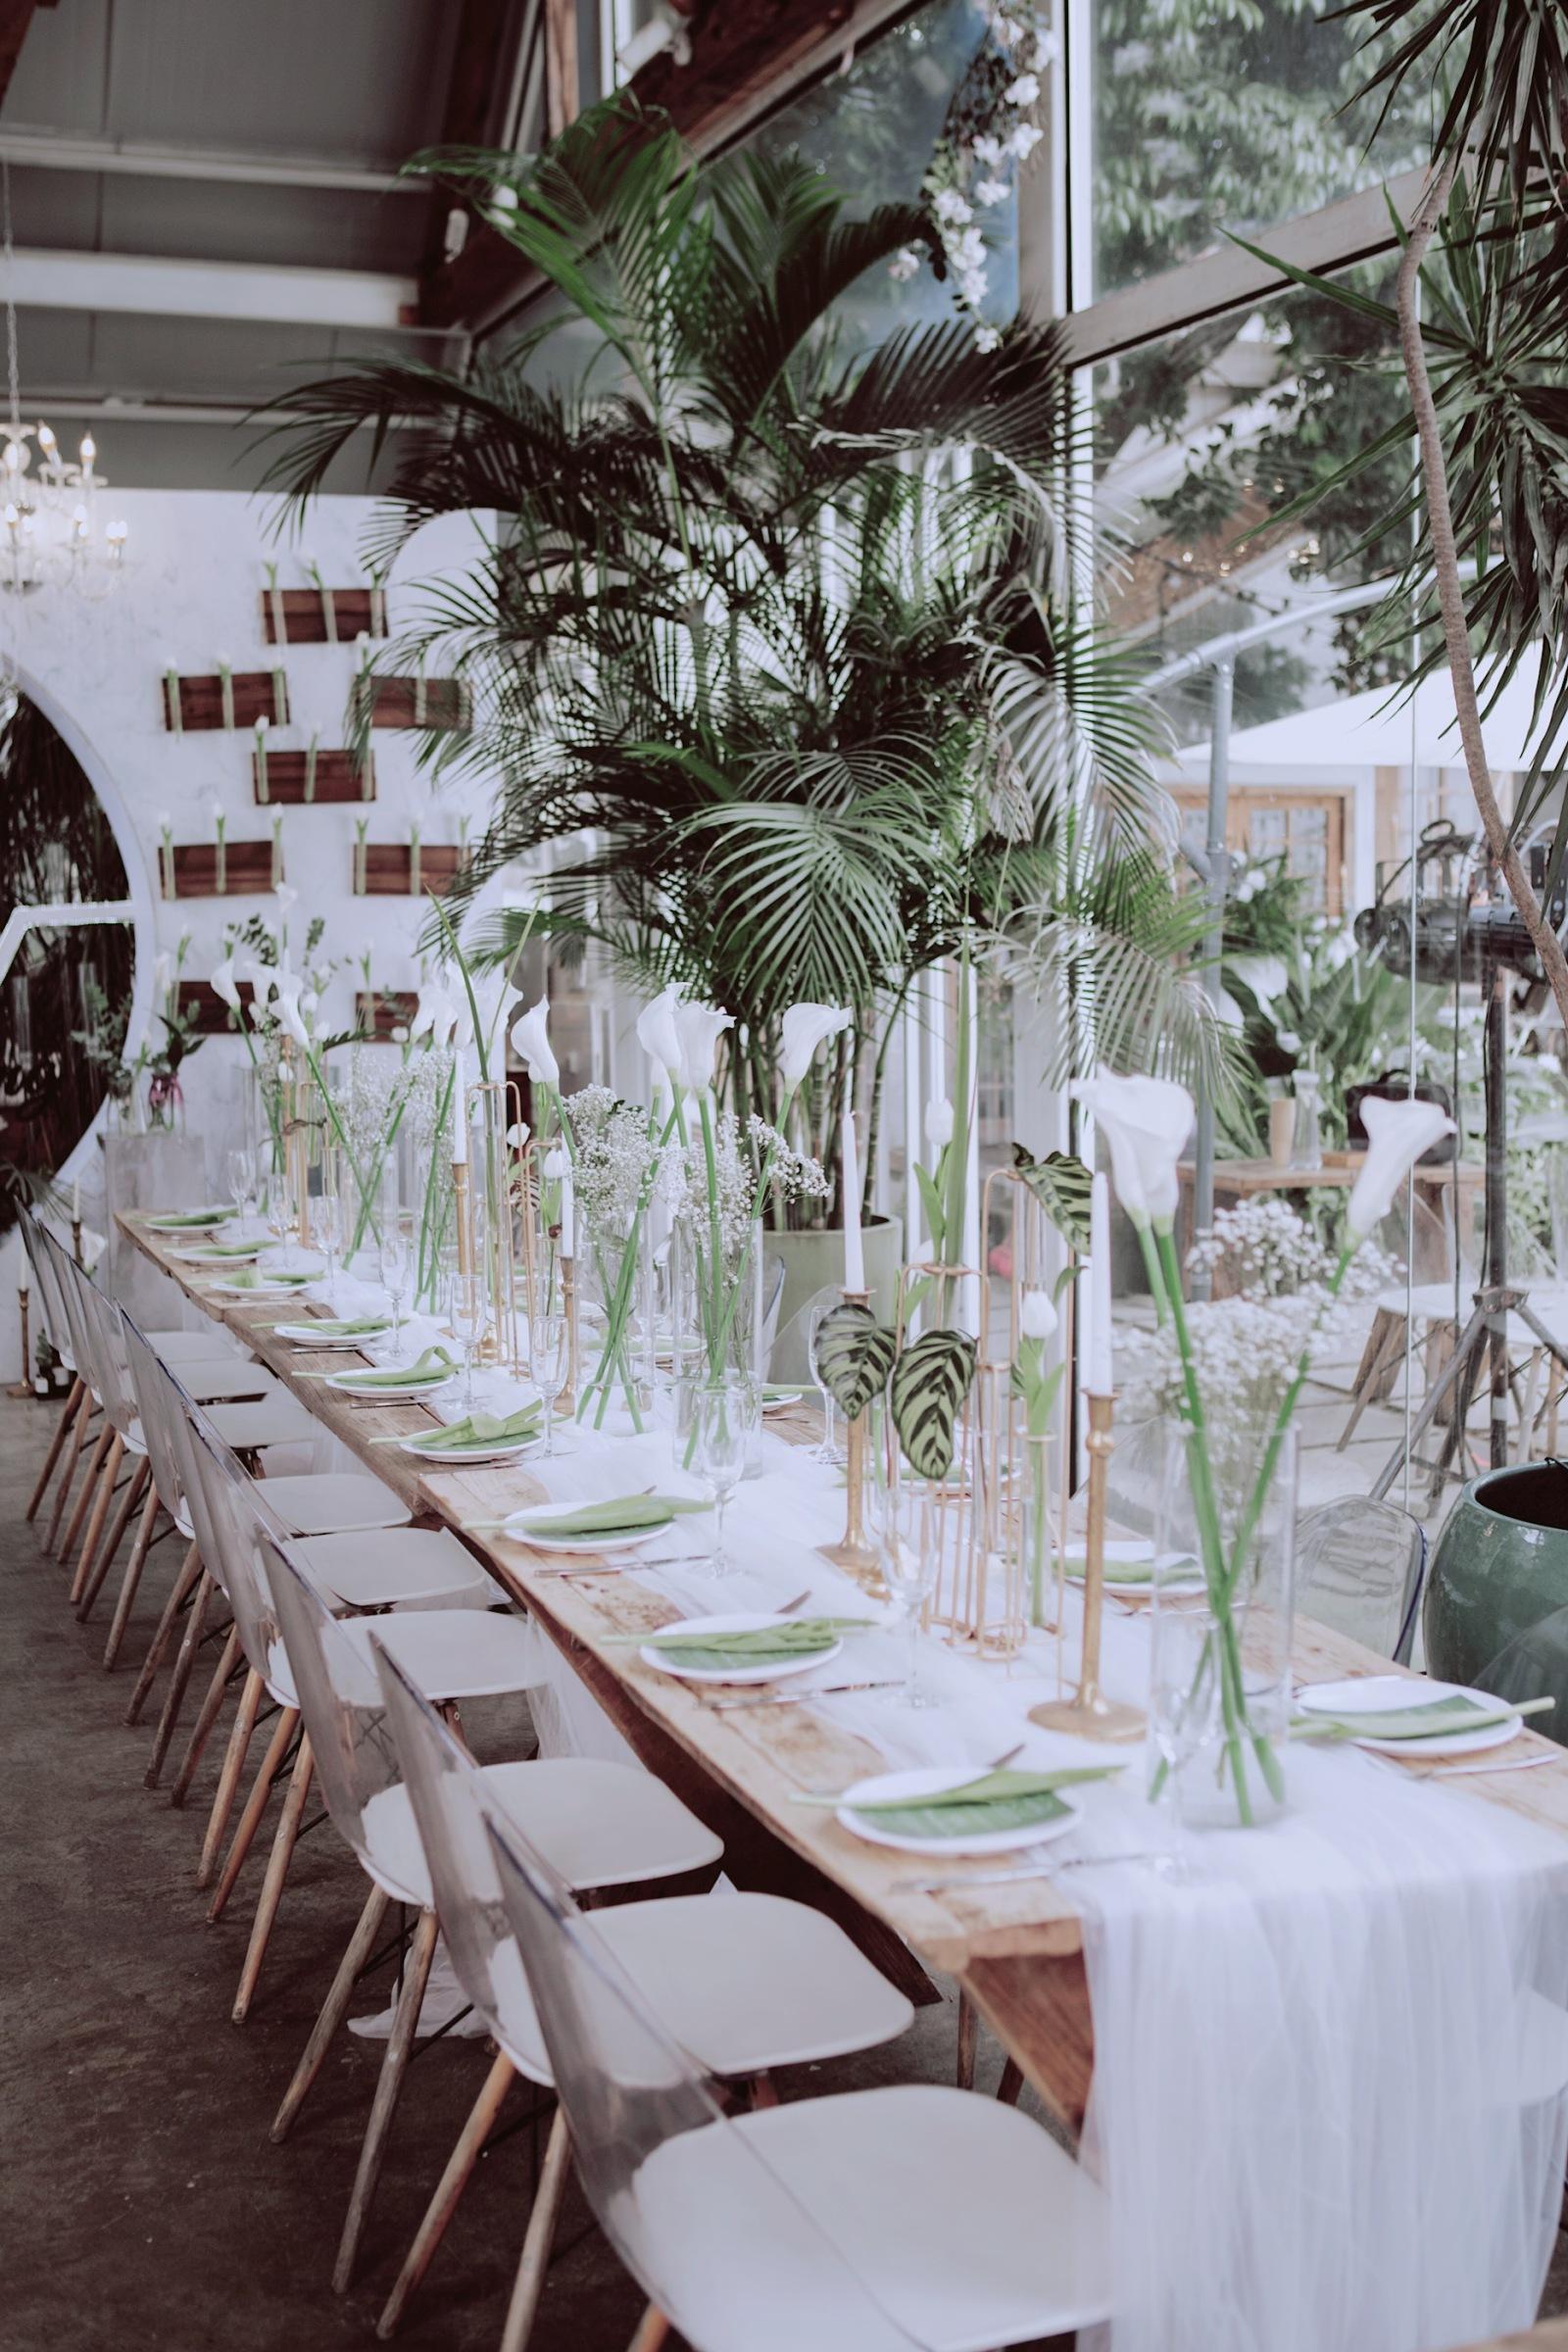 "Mint Banquet ? 薄荷晚宴-/ Mint Banquet · 薄荷晚宴这场婚礼的设计源于他们的名字和他们喜欢的色调。新郎名字里有一个""鑫"",新娘名字有一个""灵""""鑫灵相通"" ———— ""心灵相通""于是舞台是一个""O""的镂空设计值得一提的是,新娘的手捧花也是""O""型,符合她的名字的最佳设计"